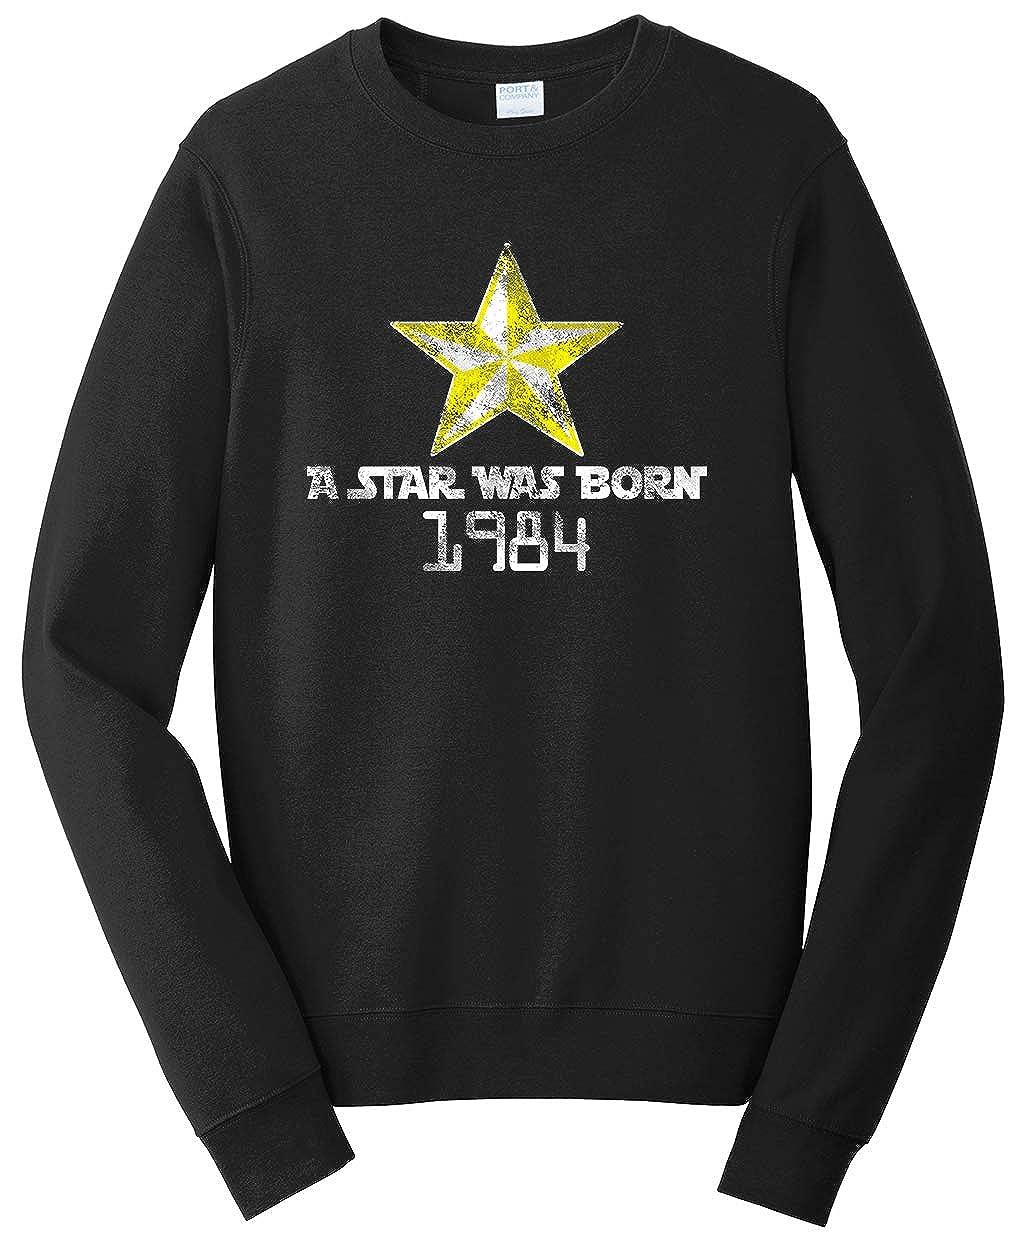 Tenacitee Unisex A Star was Born 1984 Sweatshirt